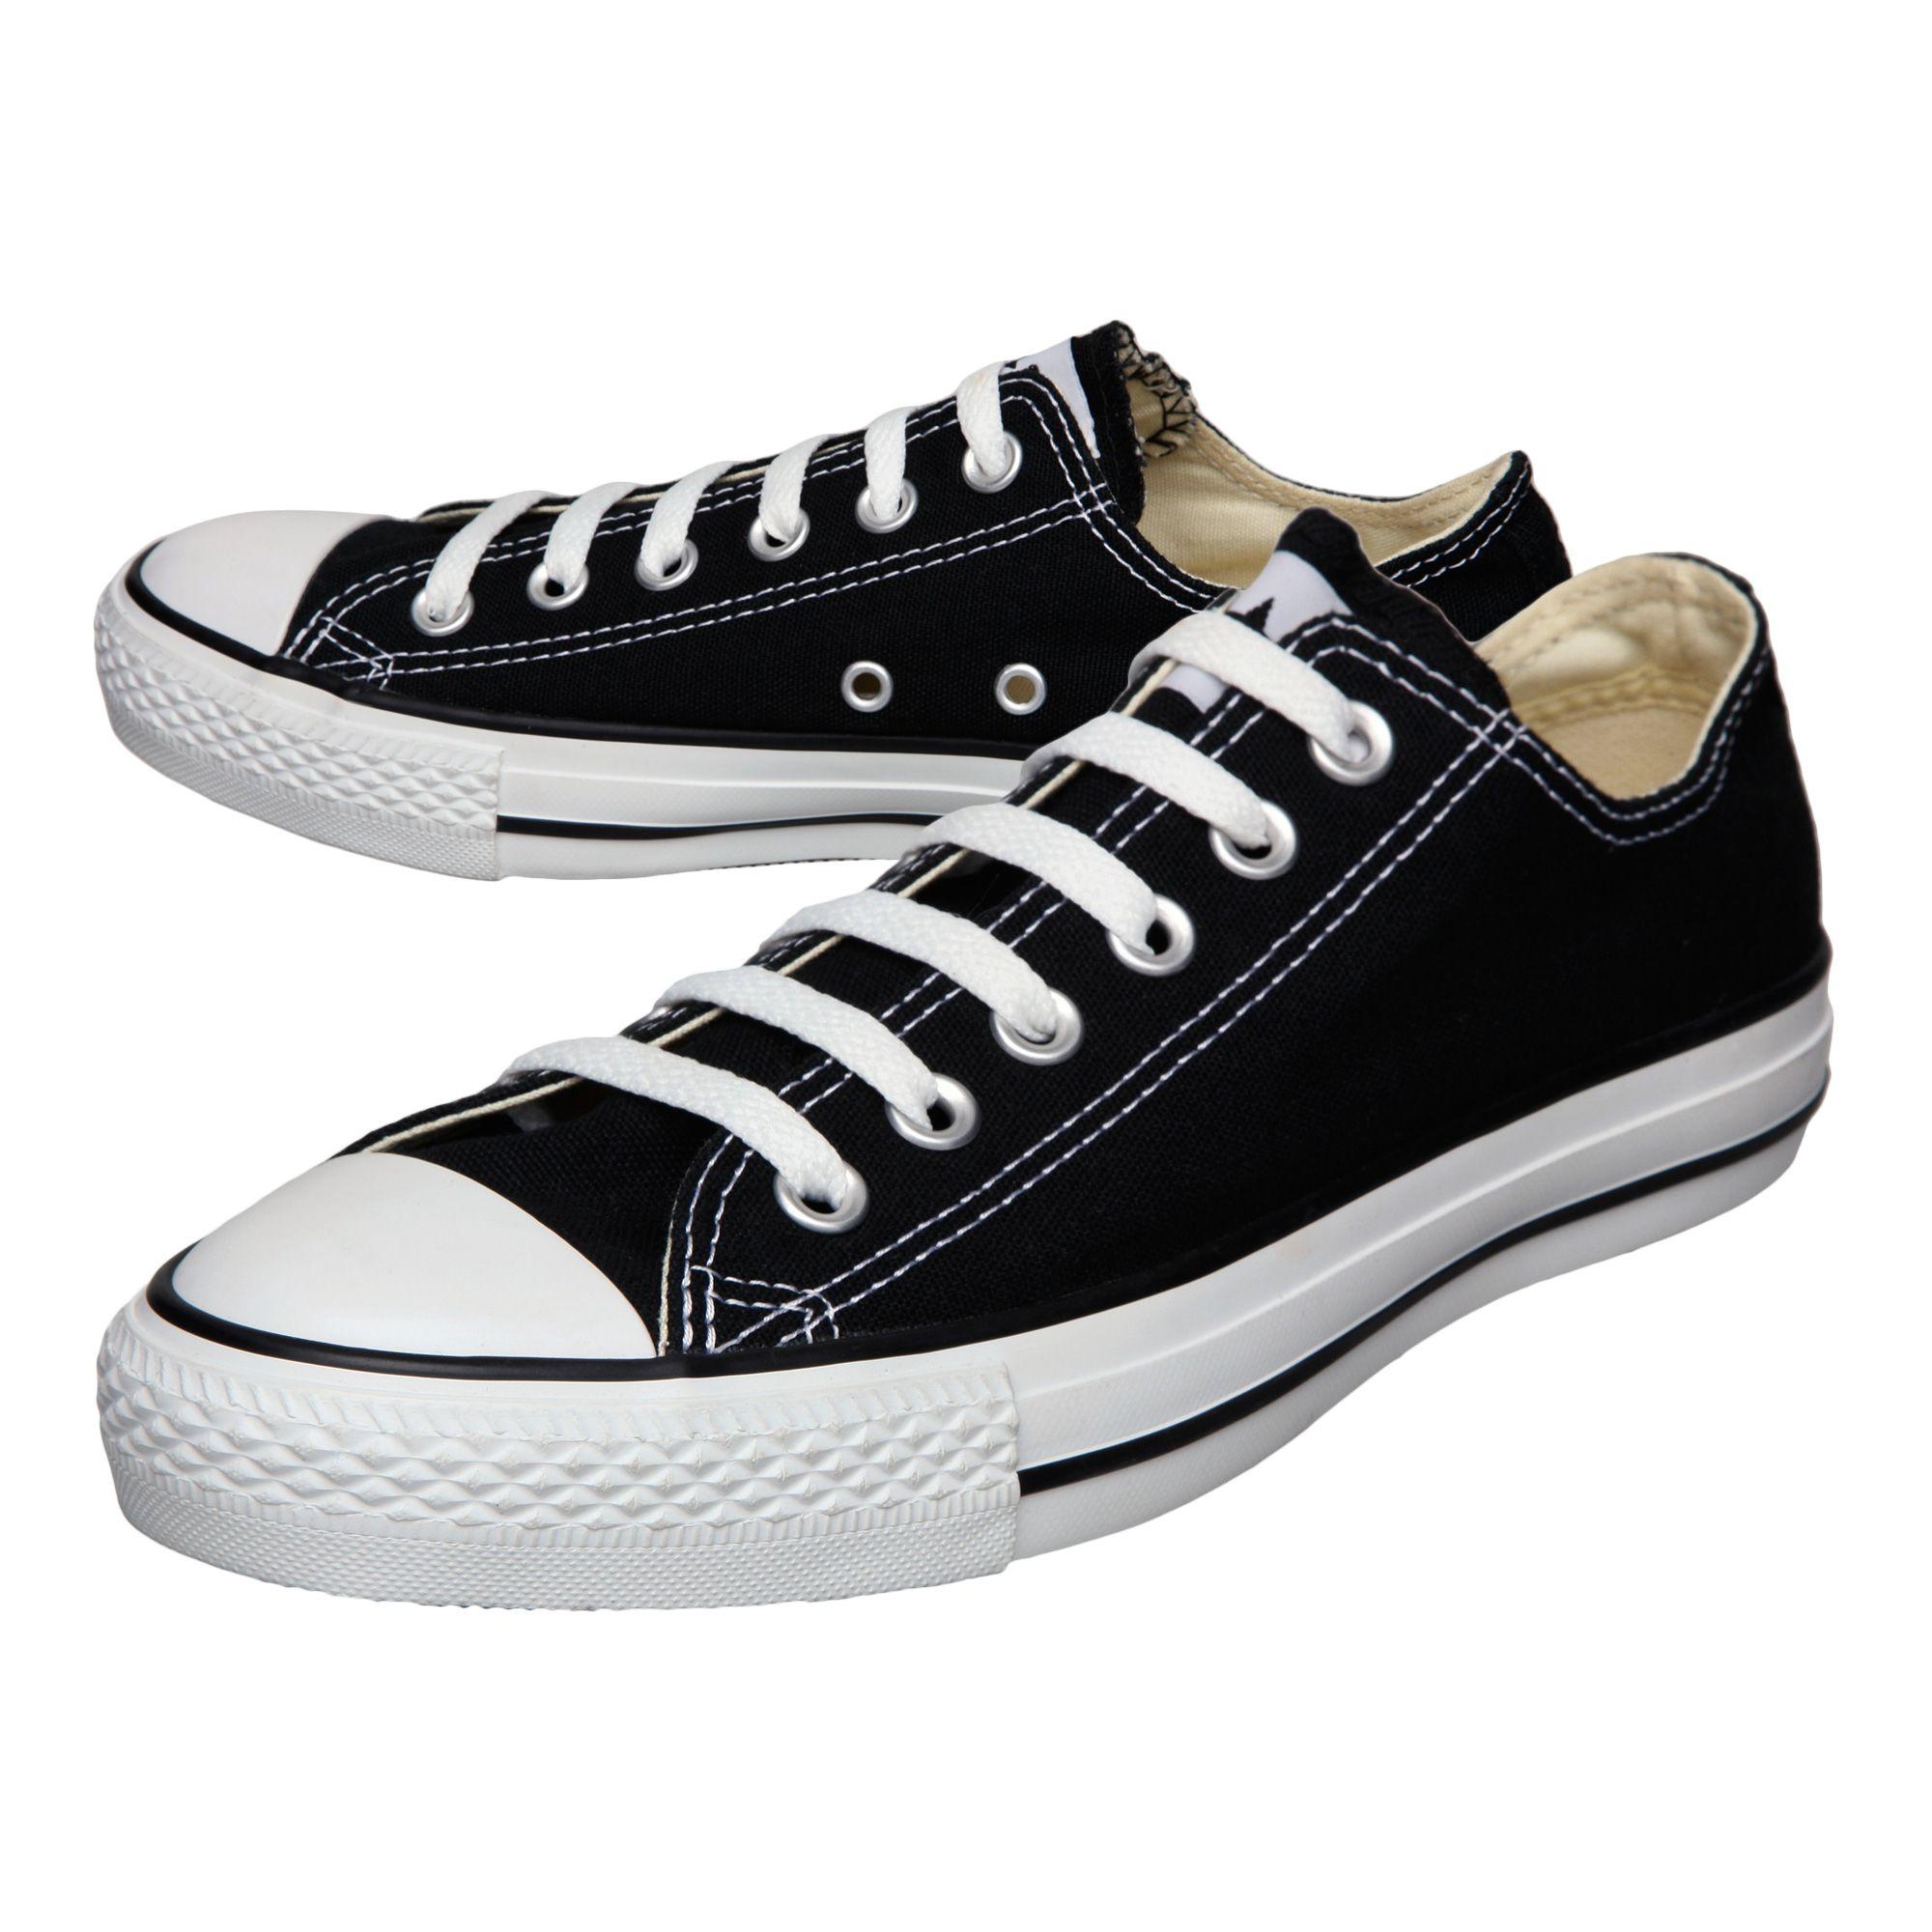 White Sox Converse Shoes